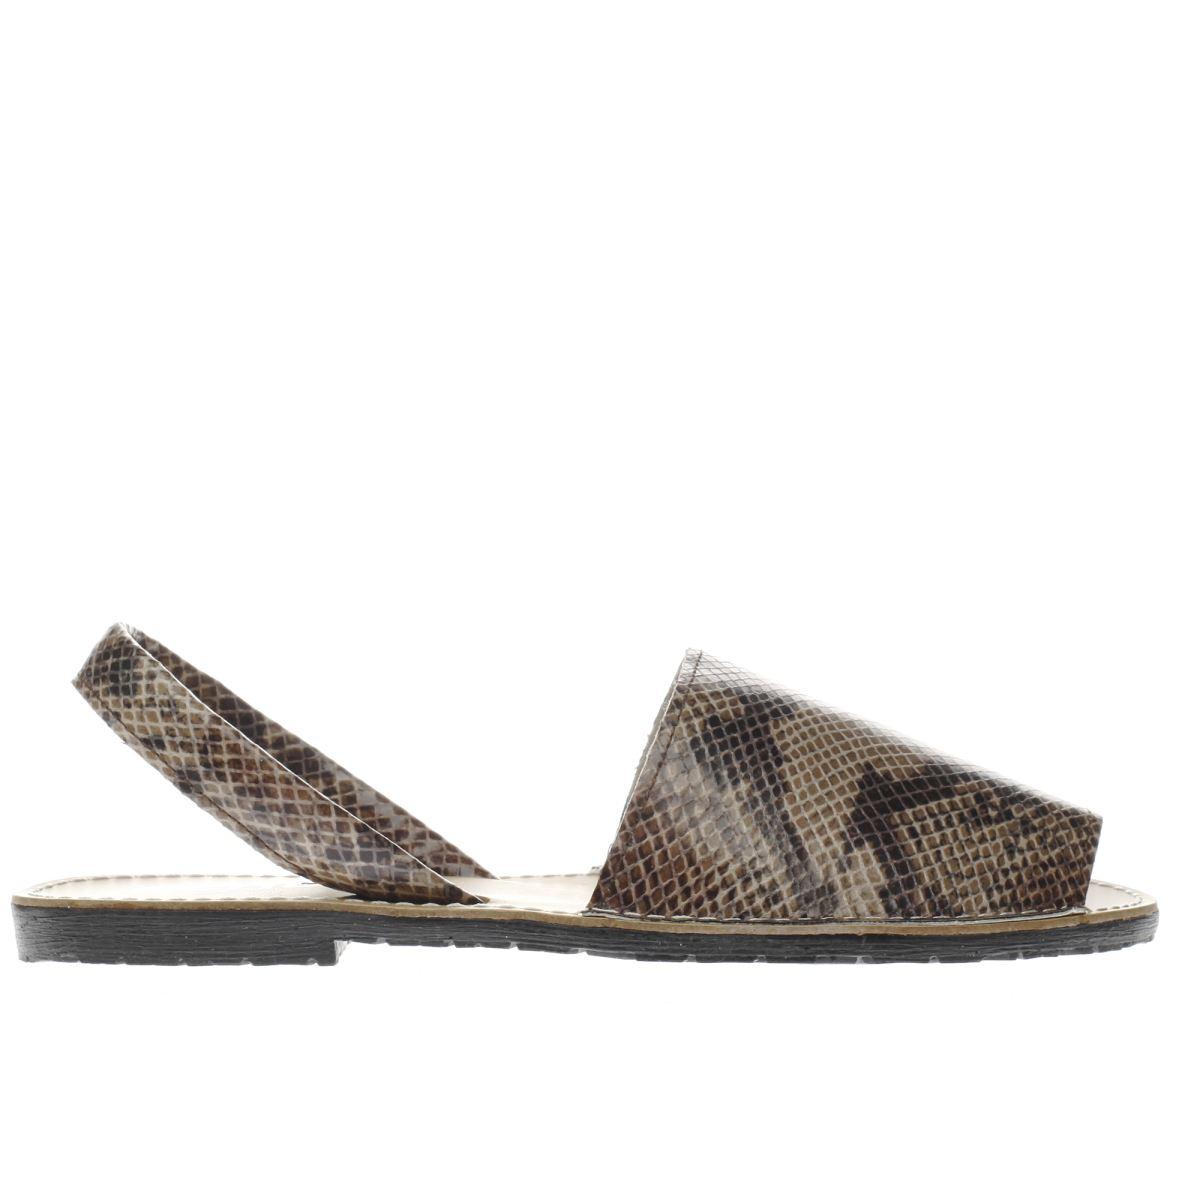 schuh beige & brown barcelona snake sandals